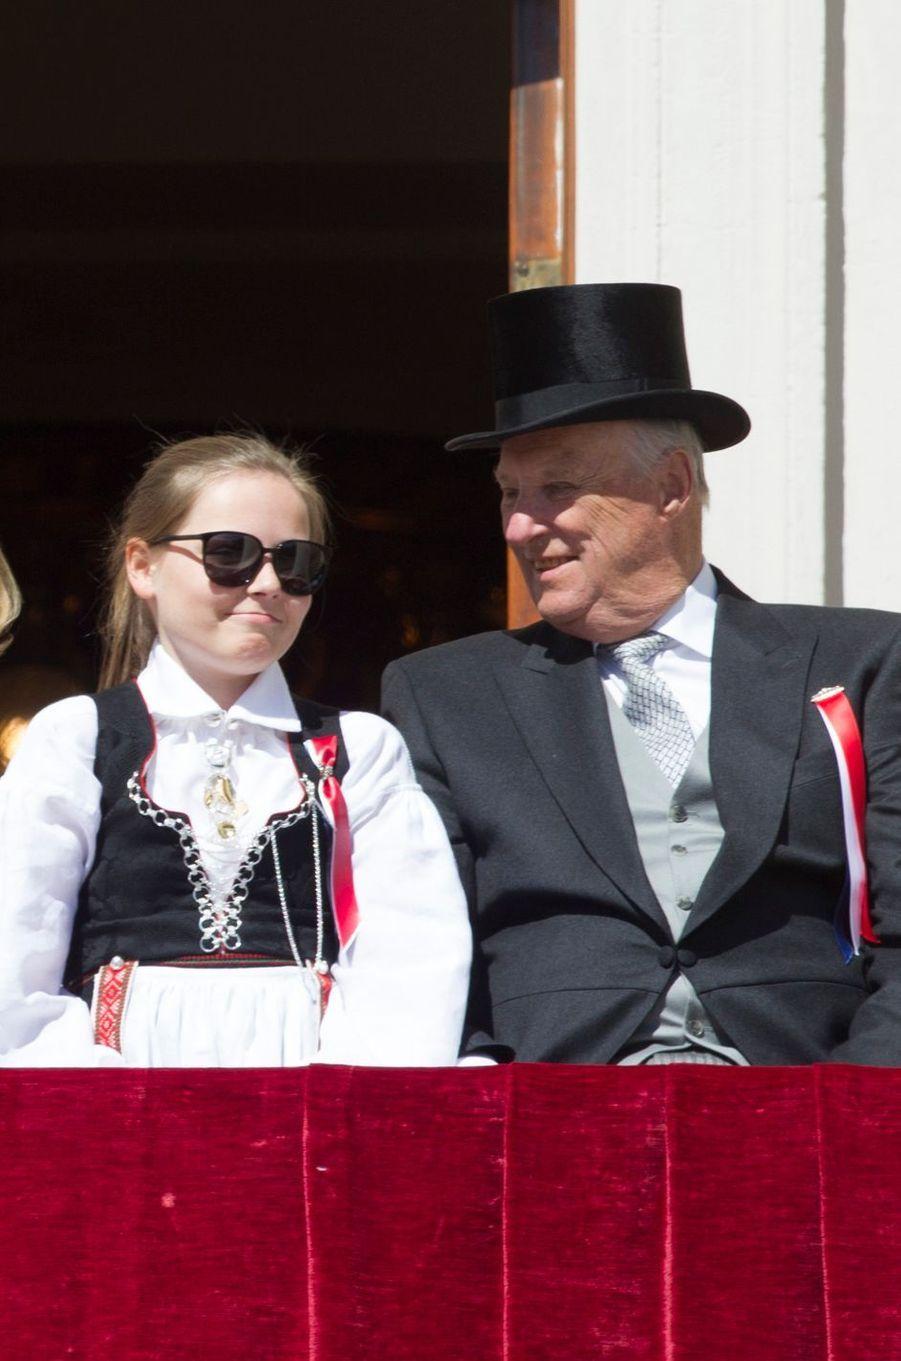 La princesse Ingrid Alexandra et le roi Harald V de Norvège à Oslo, le 17 mai 2016